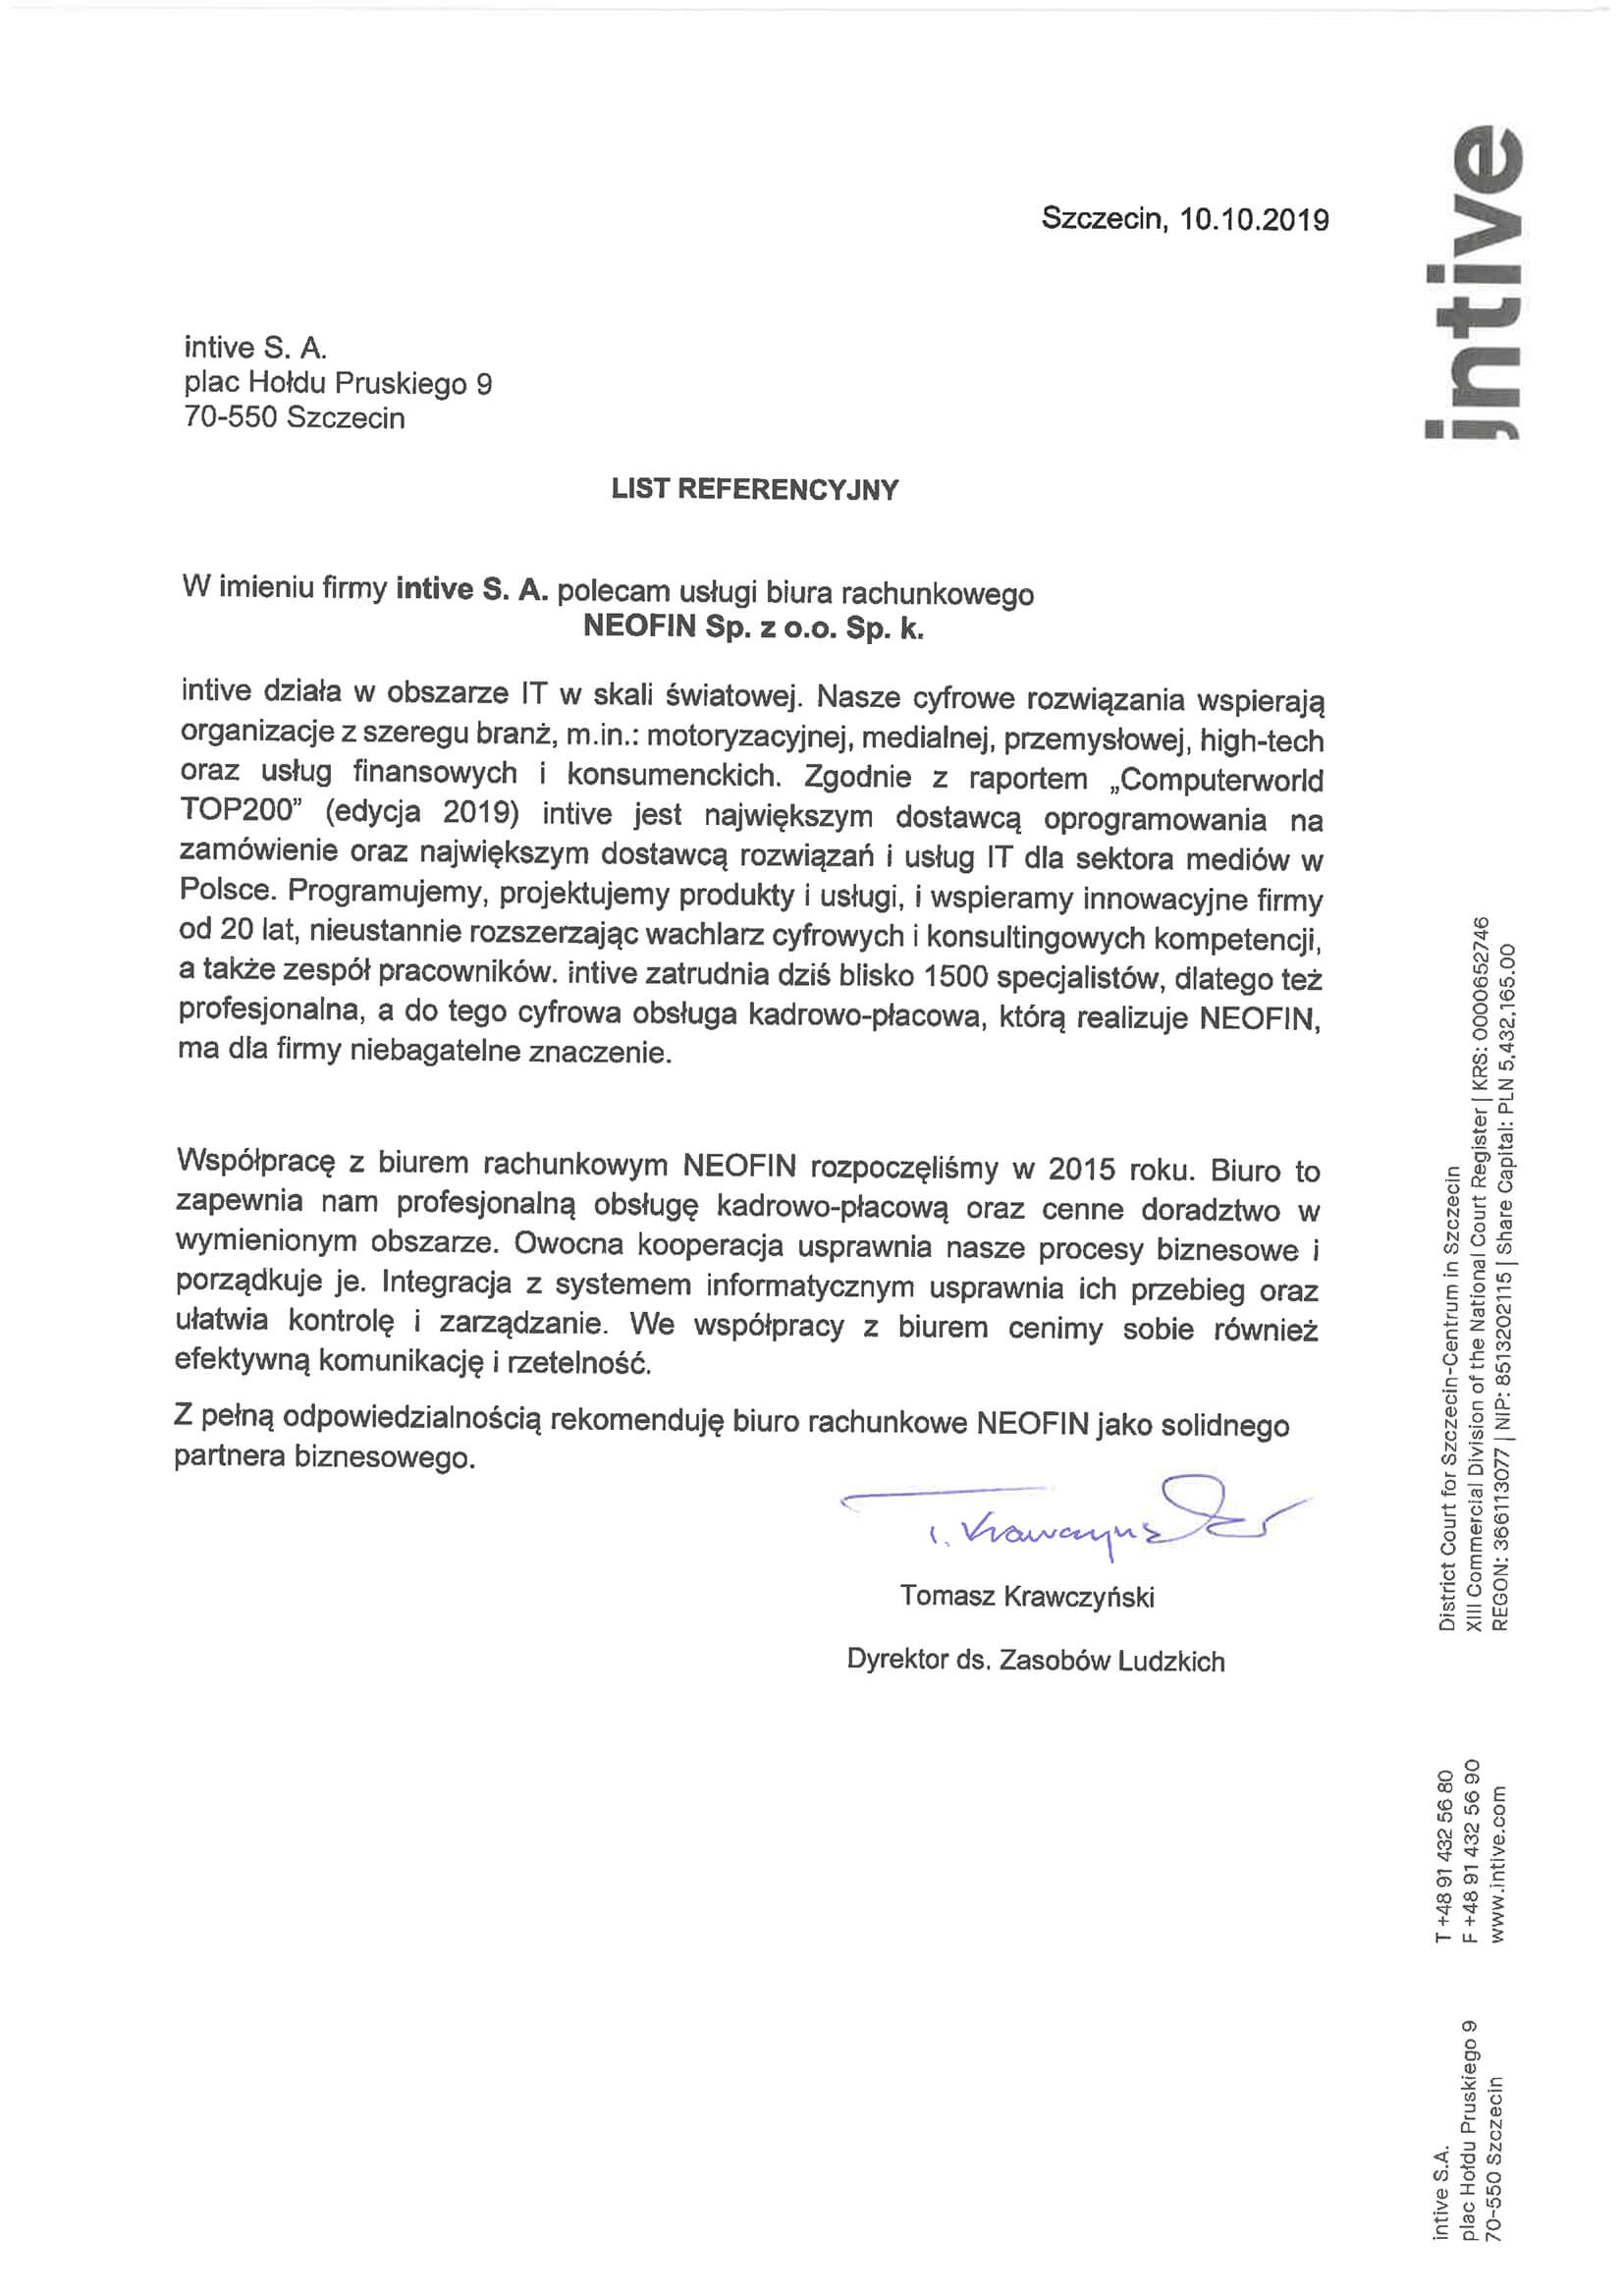 Referencje dla Neofin od Intive S.A.